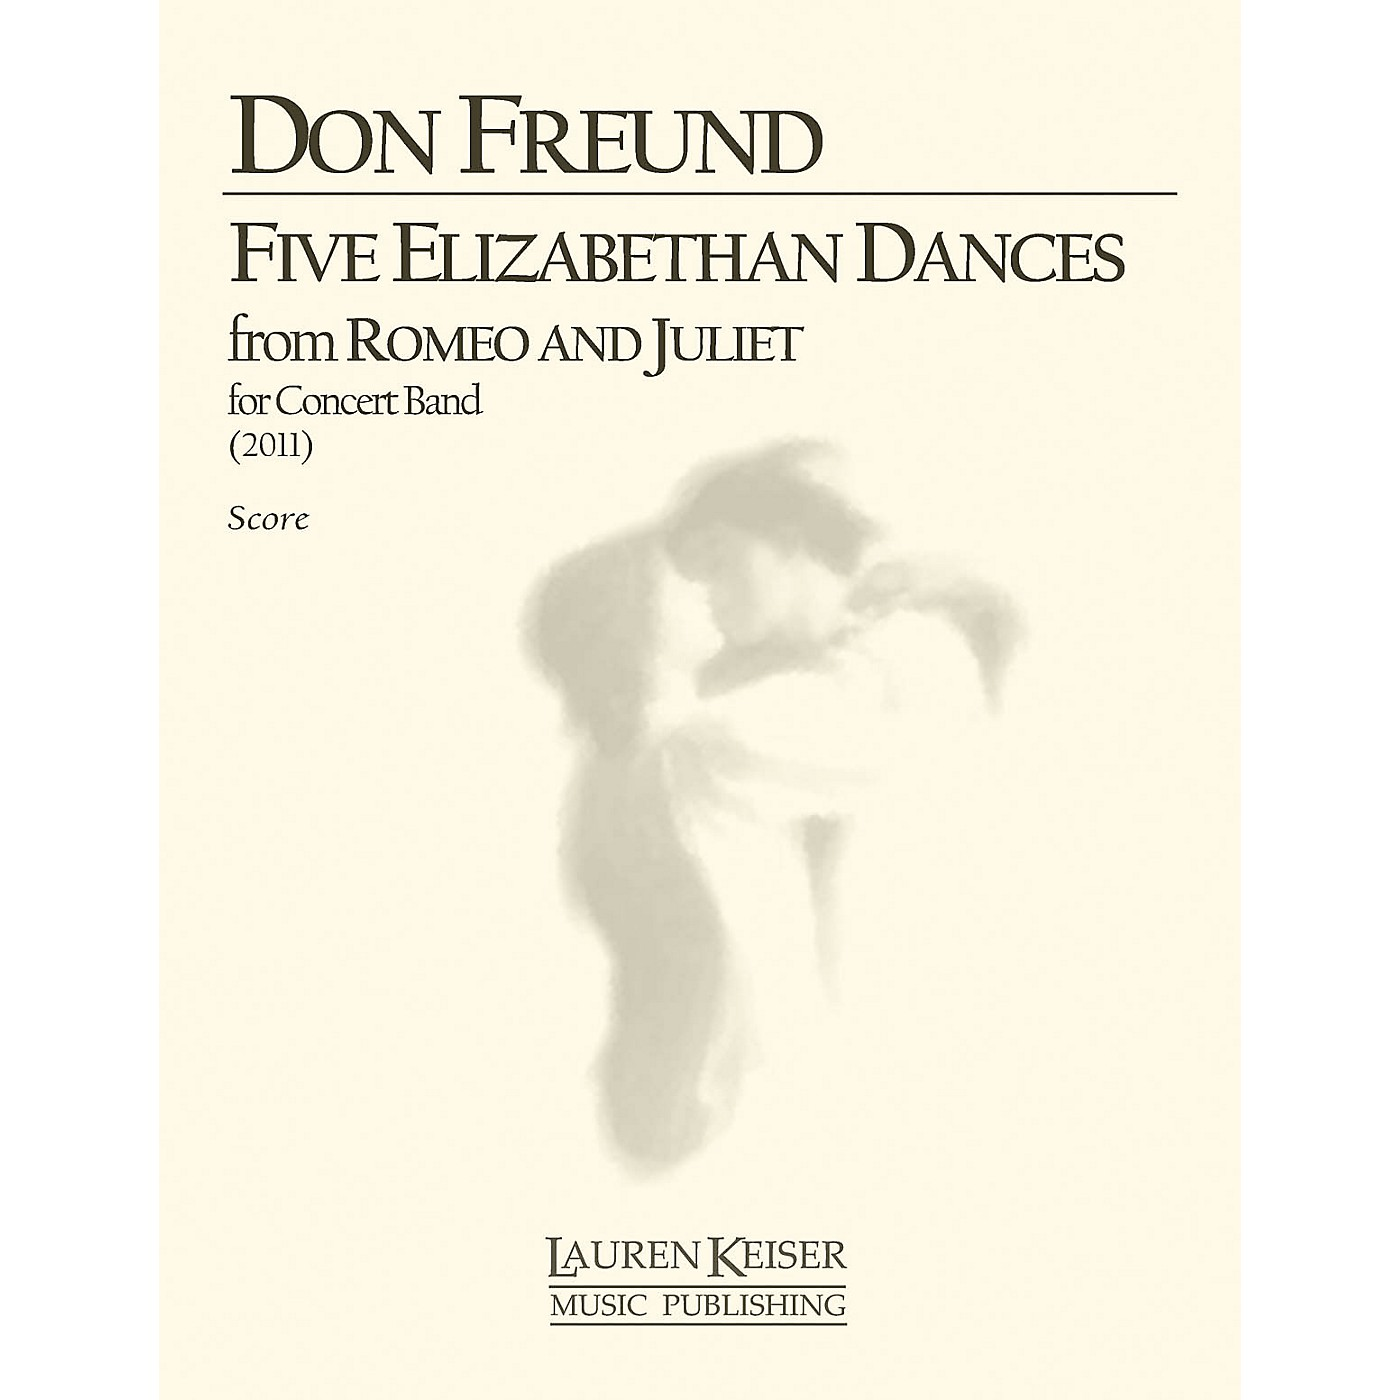 Lauren Keiser Music Publishing Five Elizabethan Dances from Romeo and Juliet (Wind Ensemble, Full Score) LKM Music Series by Don Freund thumbnail